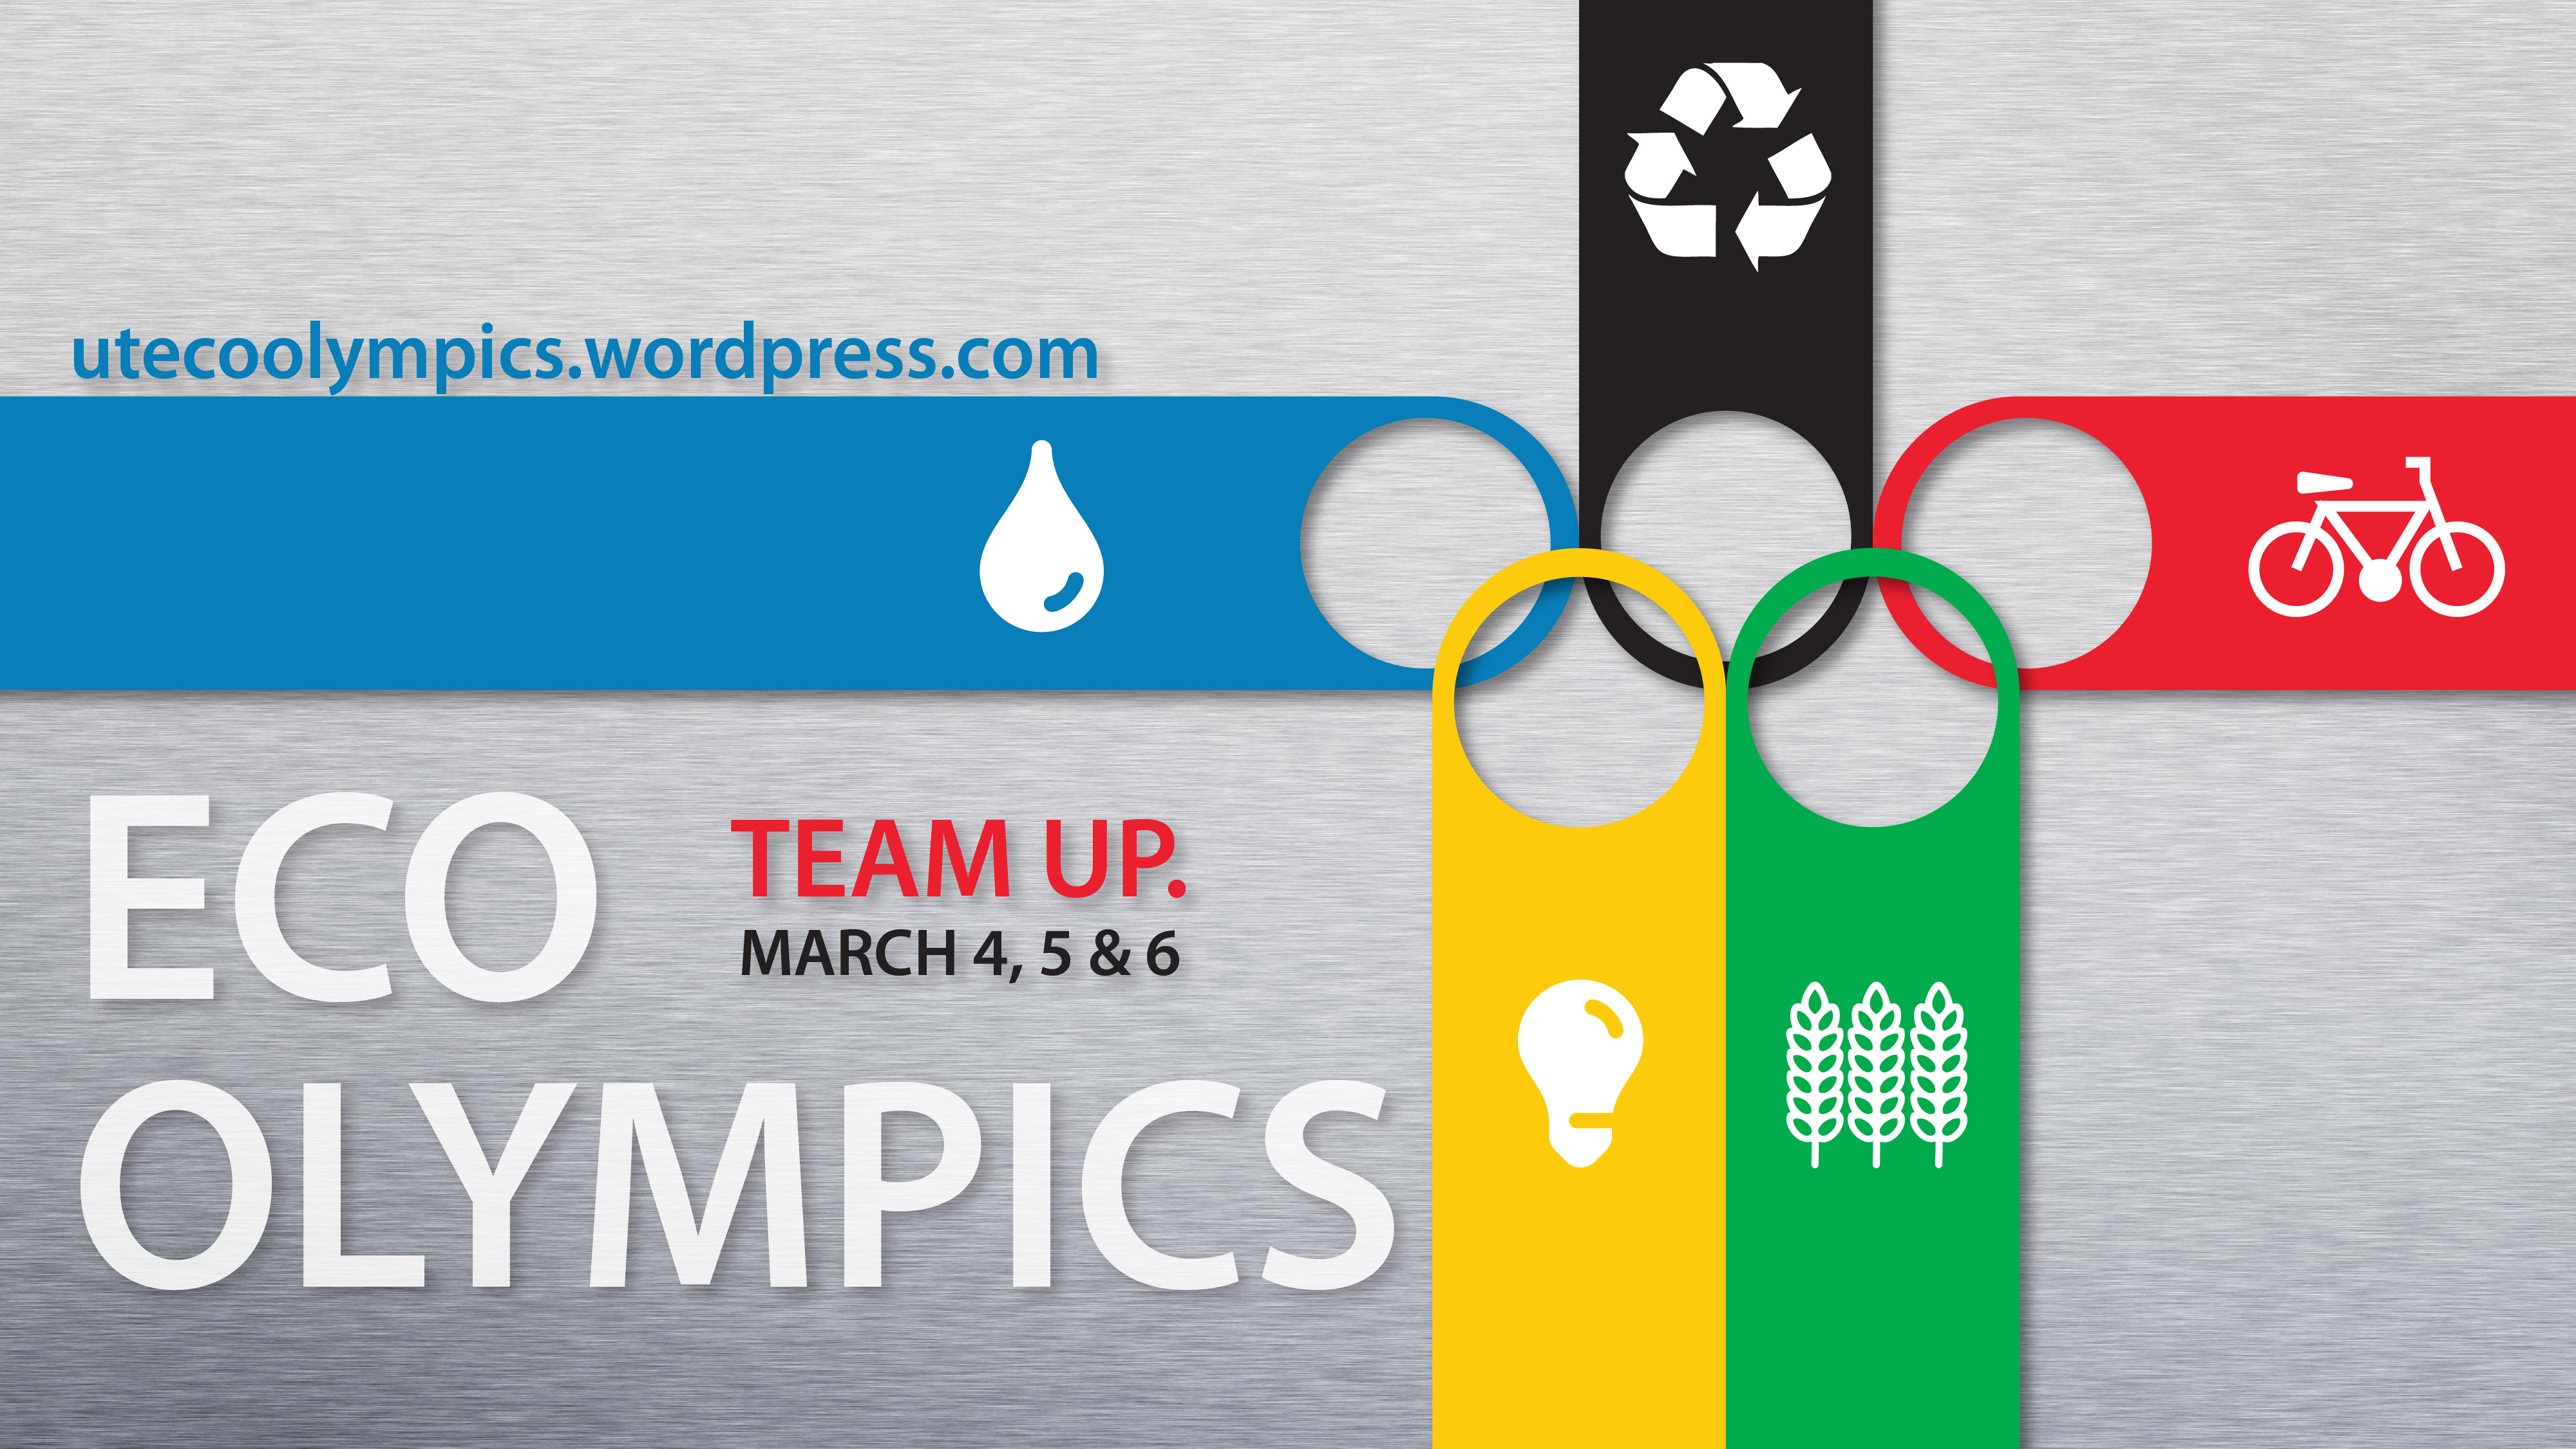 Eco-Olympics_DigiKnow-01.jpg